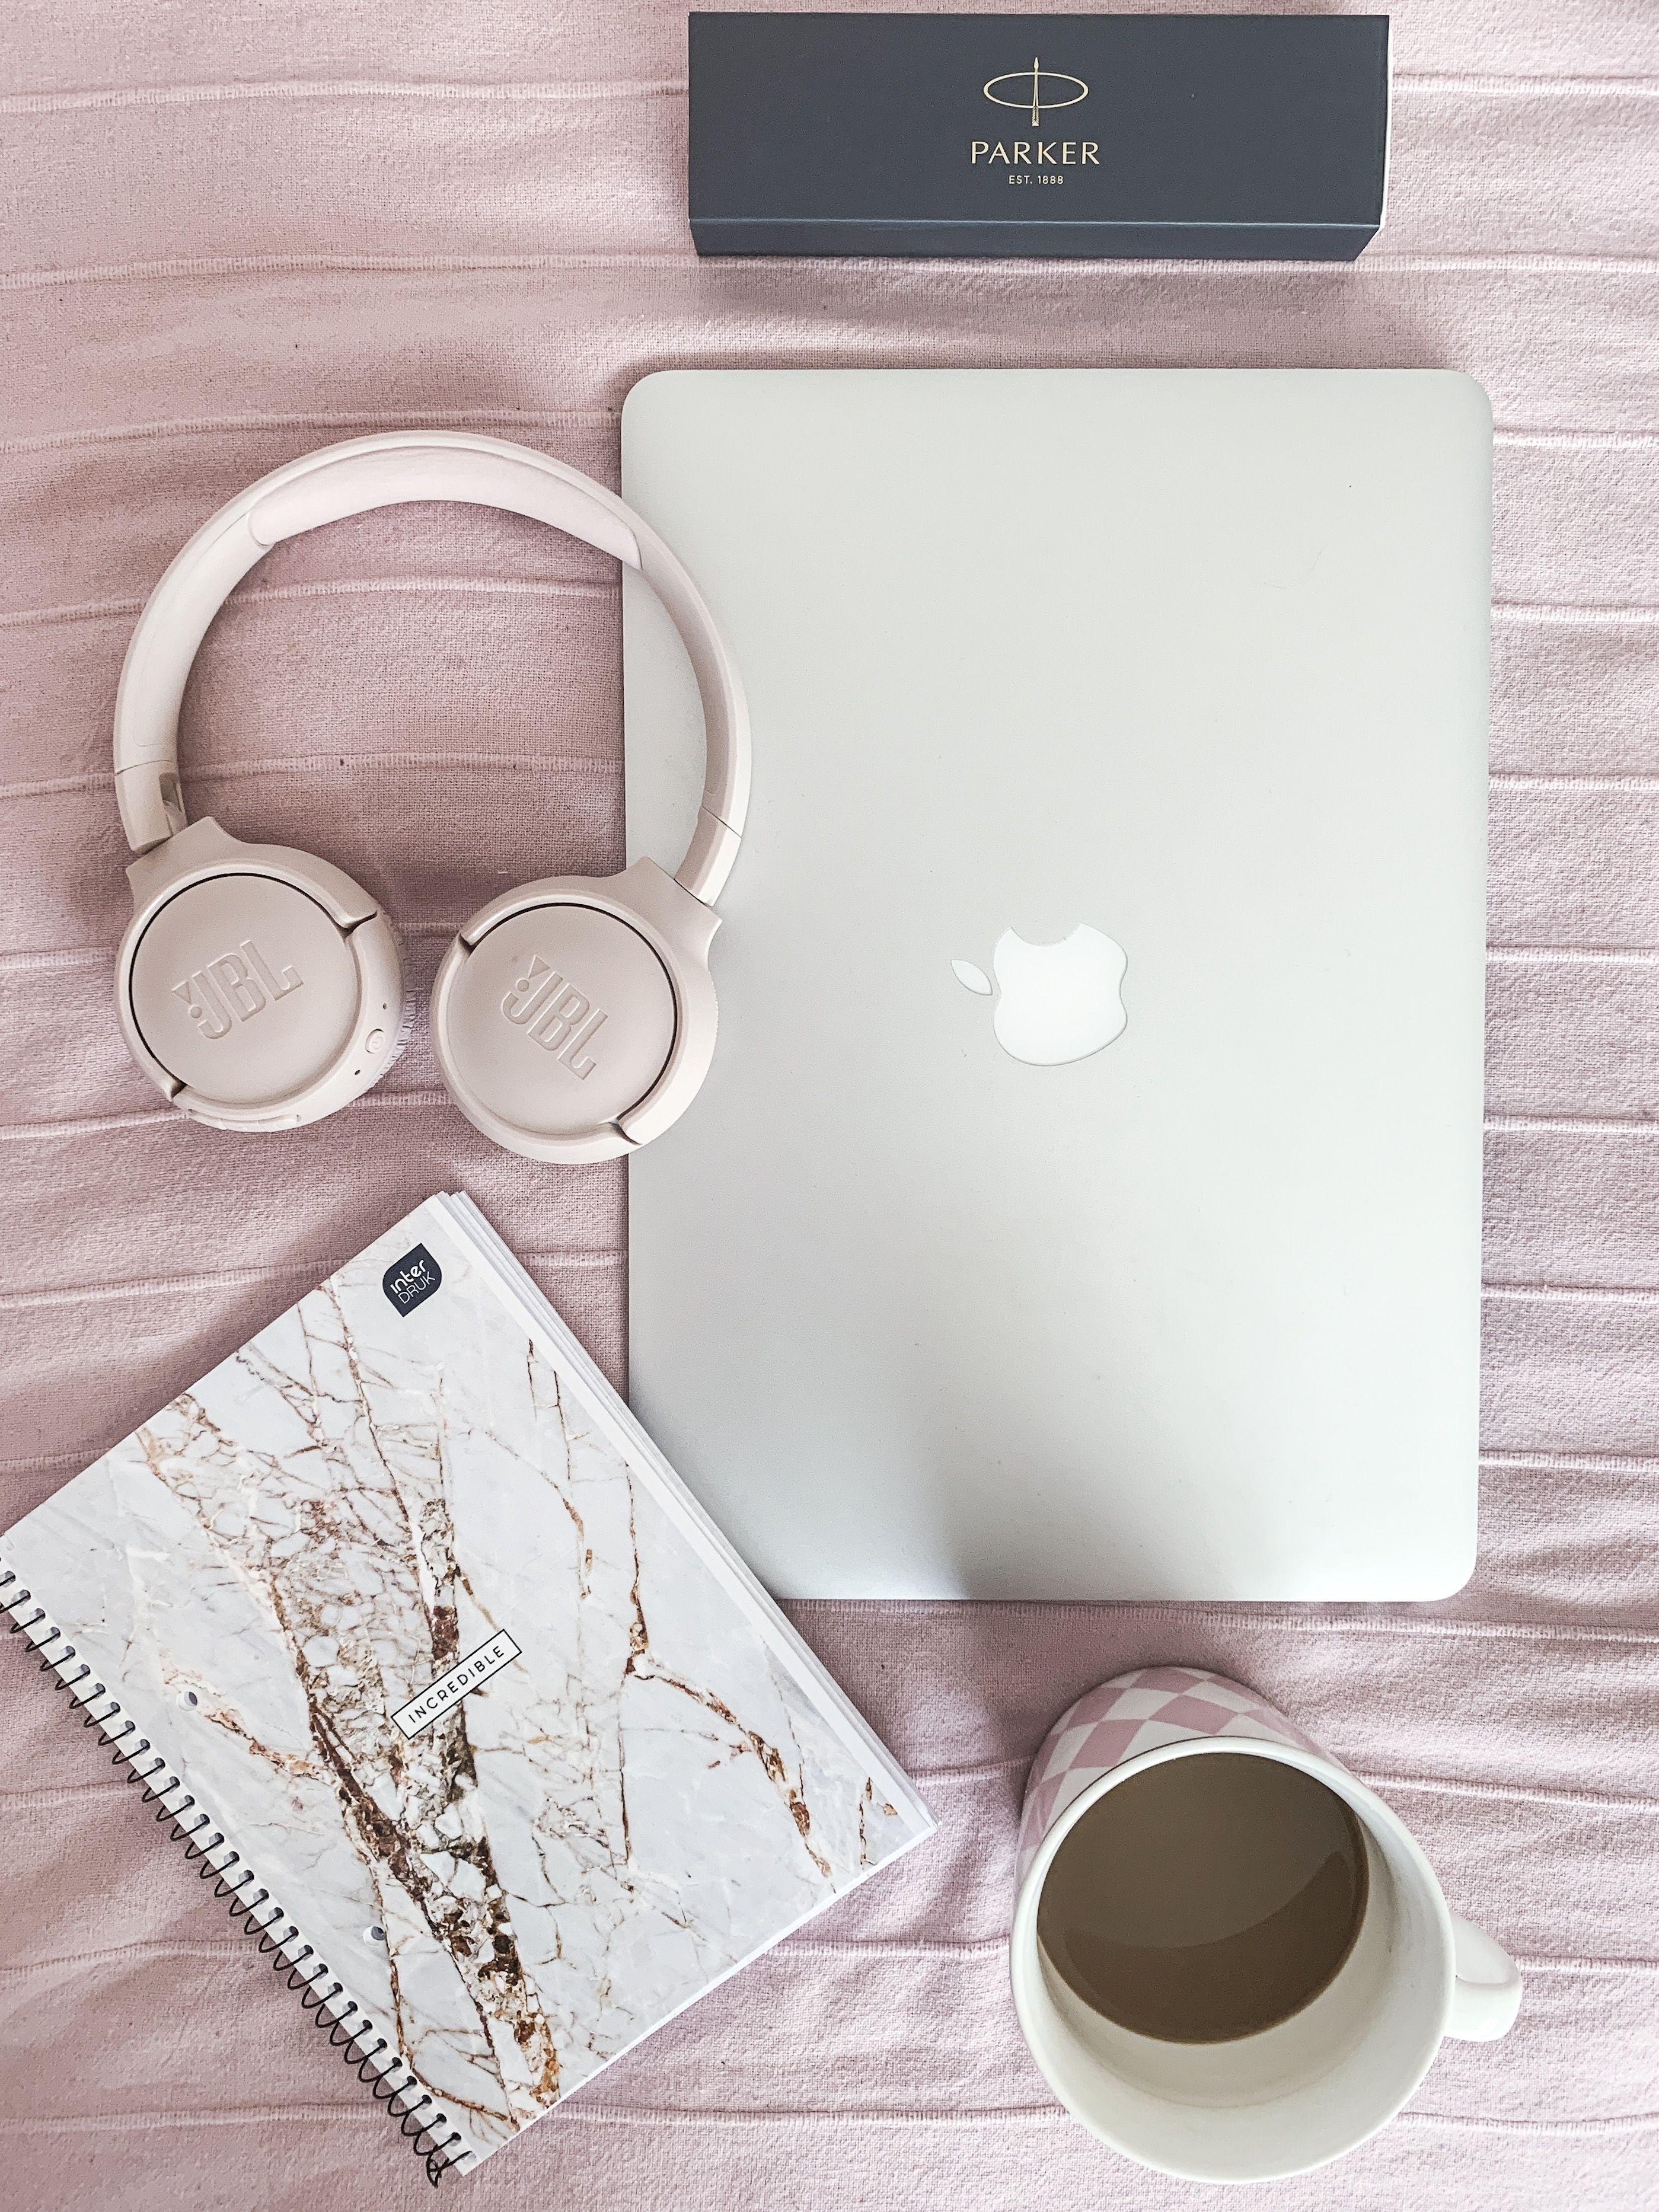 Pin On Macbook Wallpaper Hd